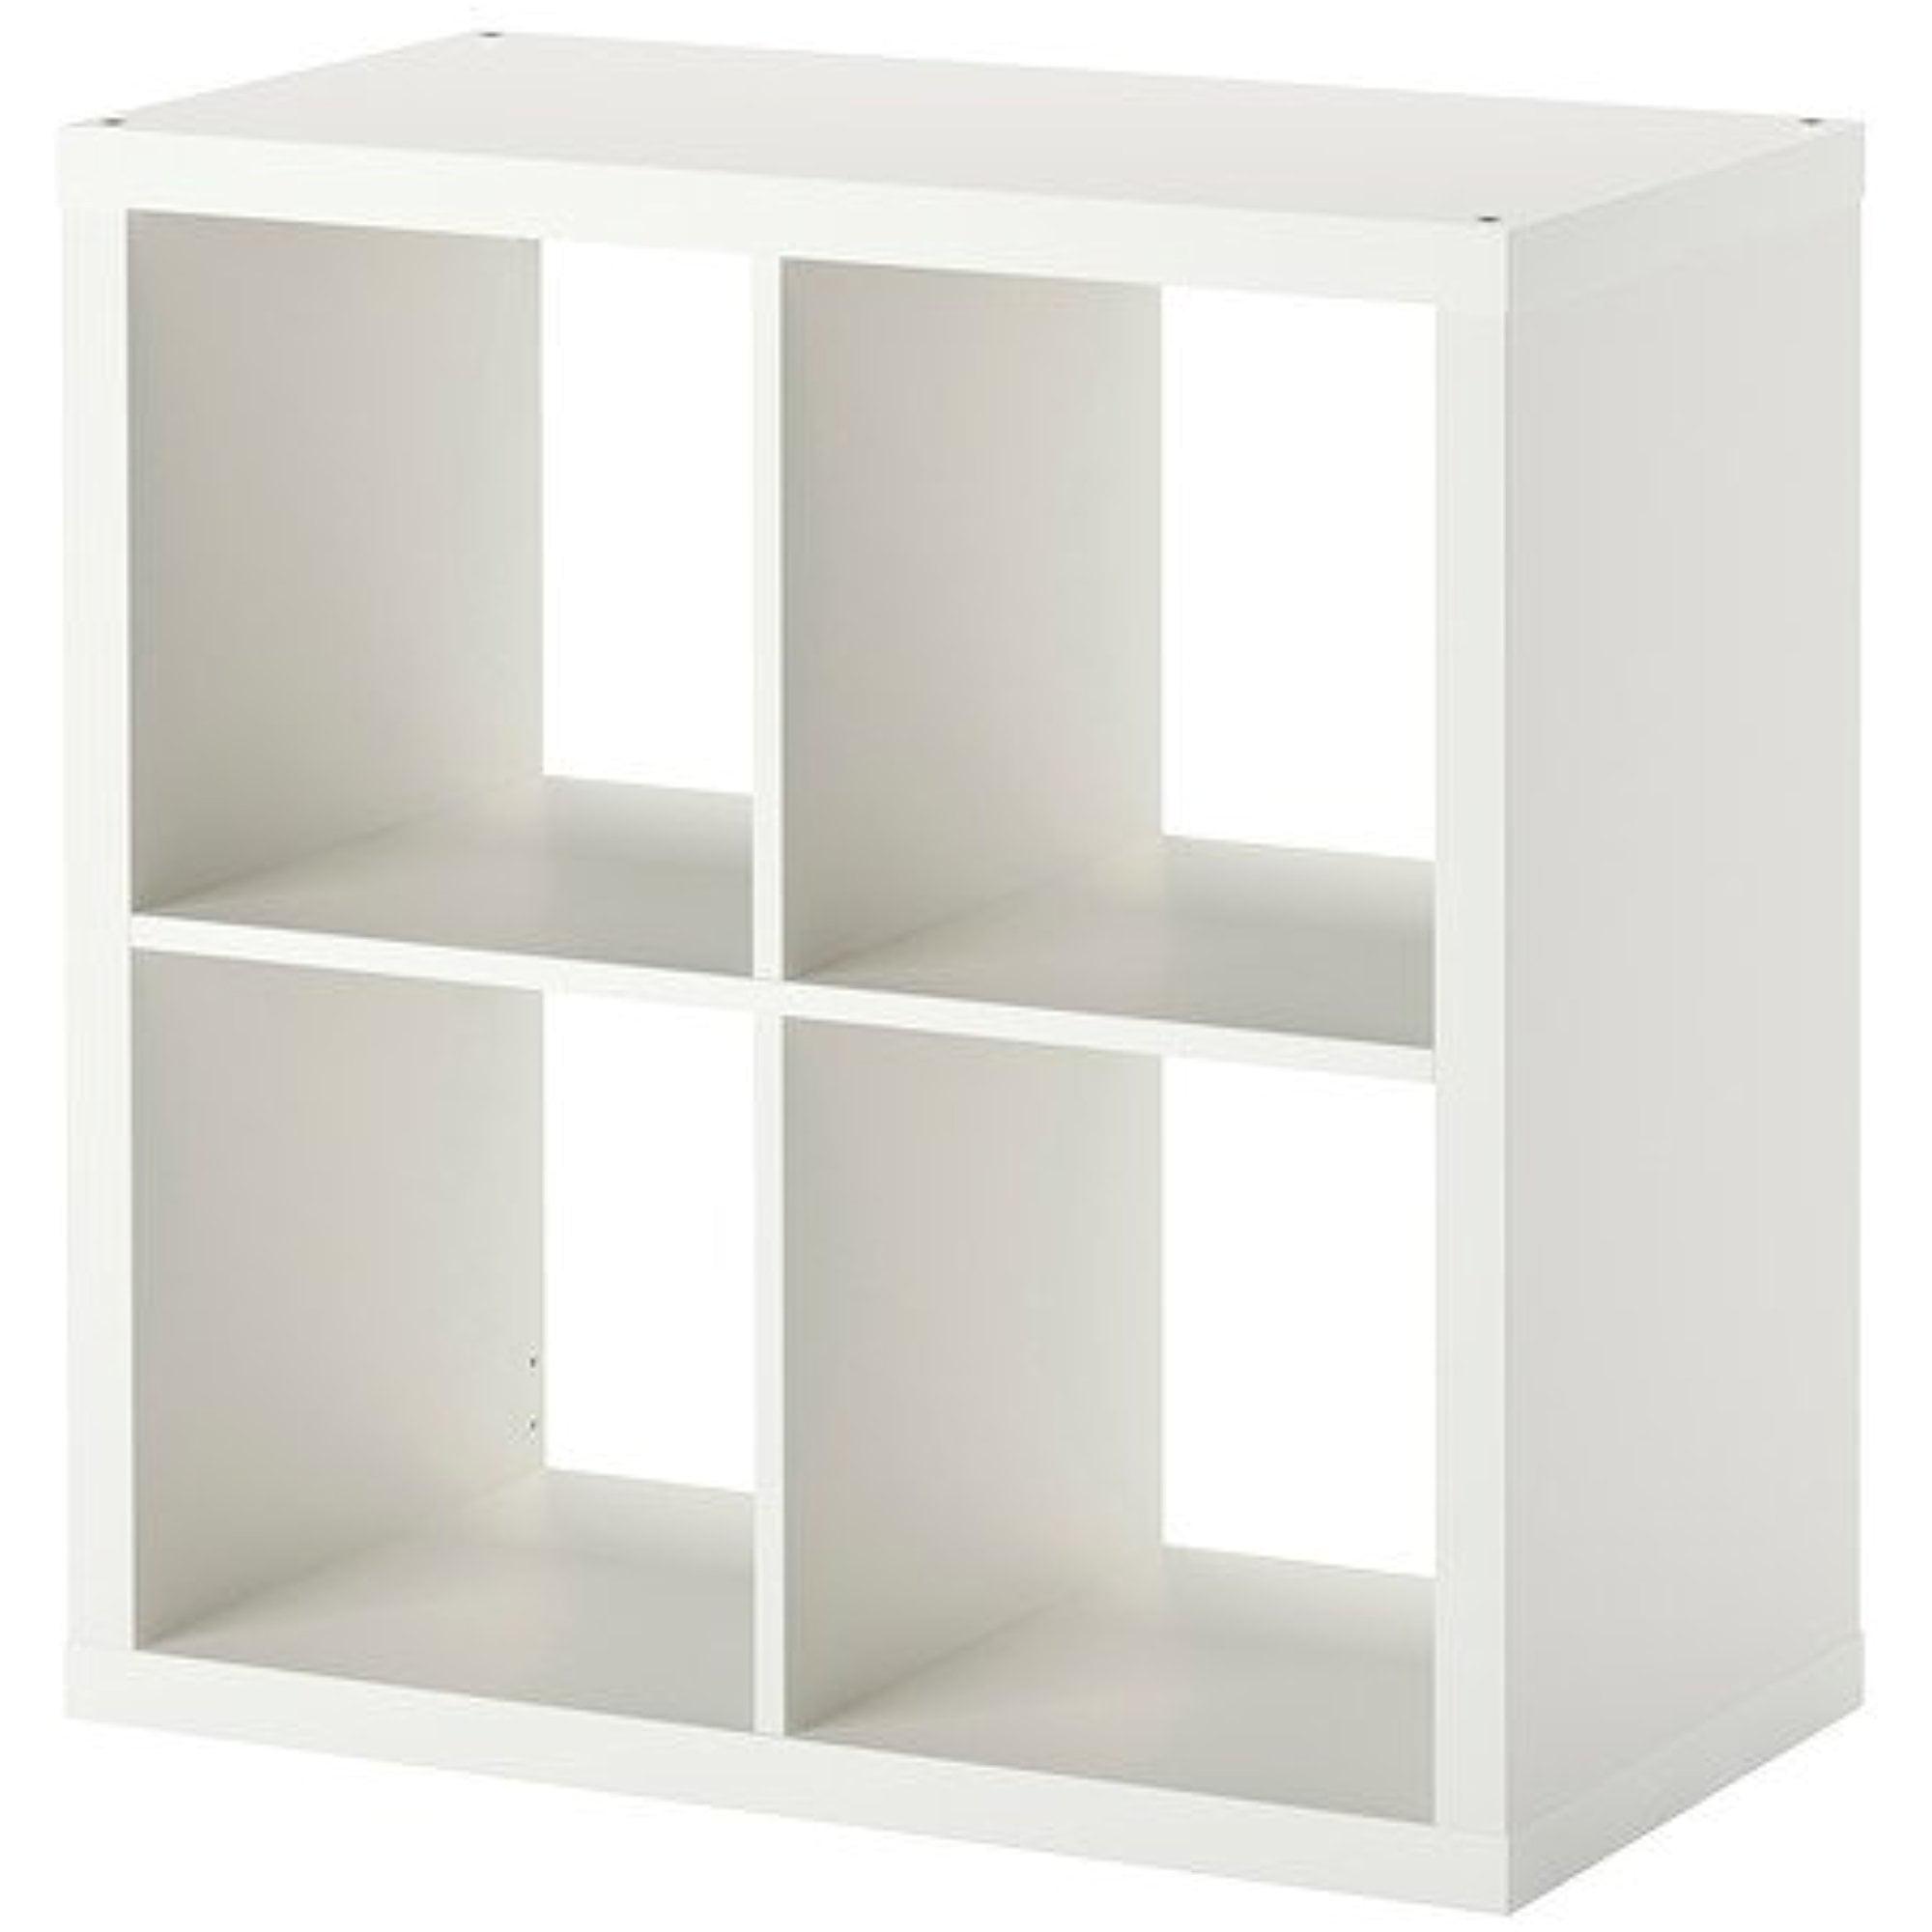 on sale 7c03c d88b3 Ikea Kallax Bookcase Shelving Unit Cube Display, 10210.231726.410